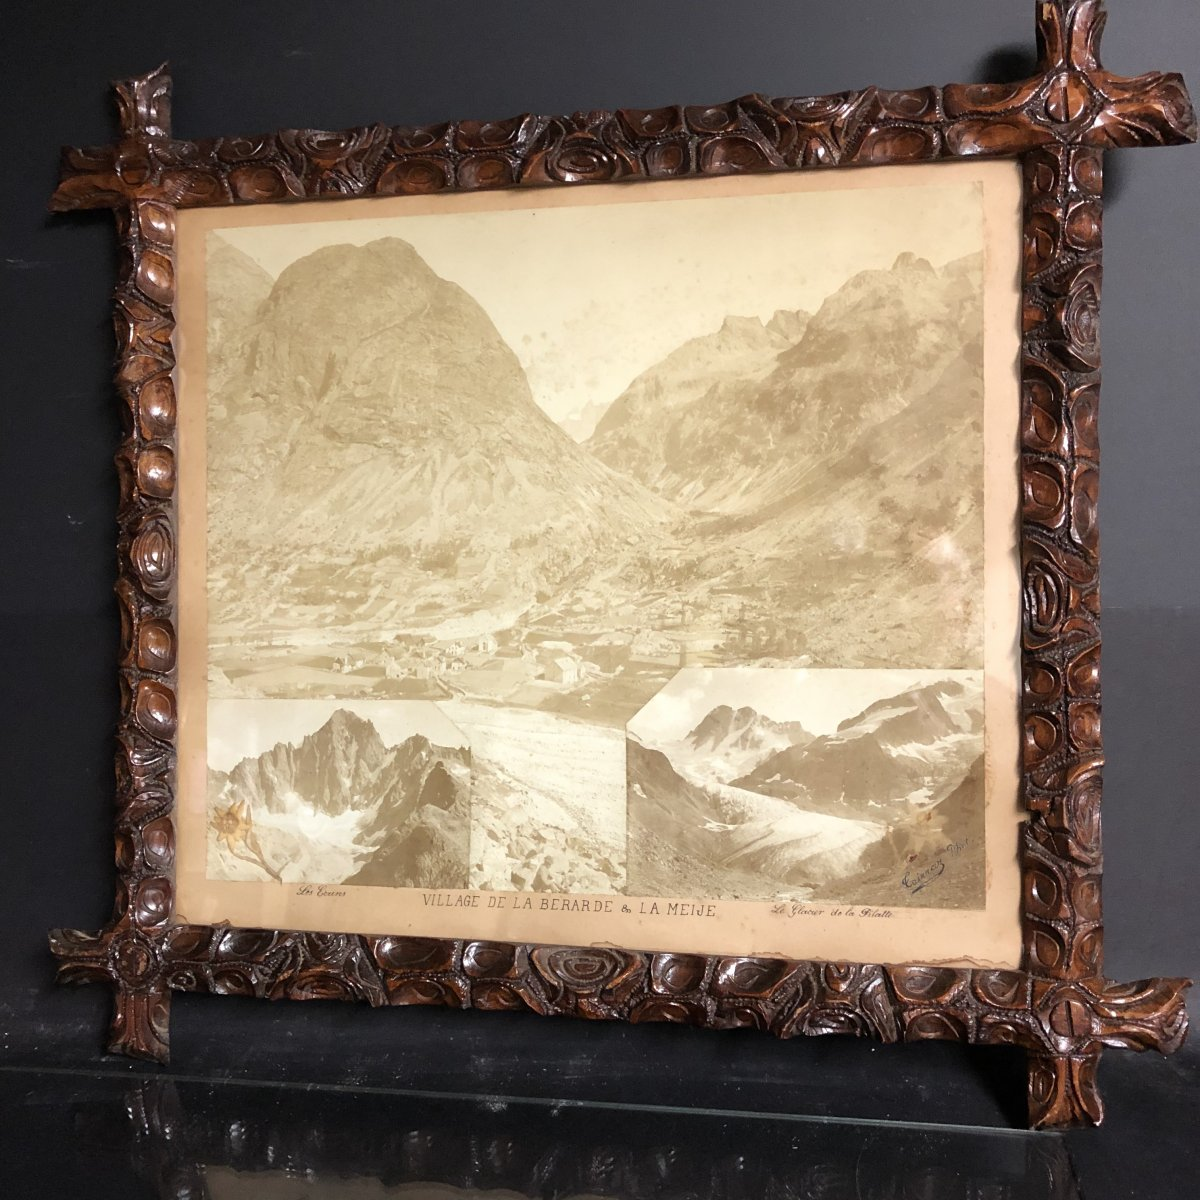 Tairraz X3 Photography Bérarde La Meije Les Ecrins Mountain Alps Frame Popular Art XIXth